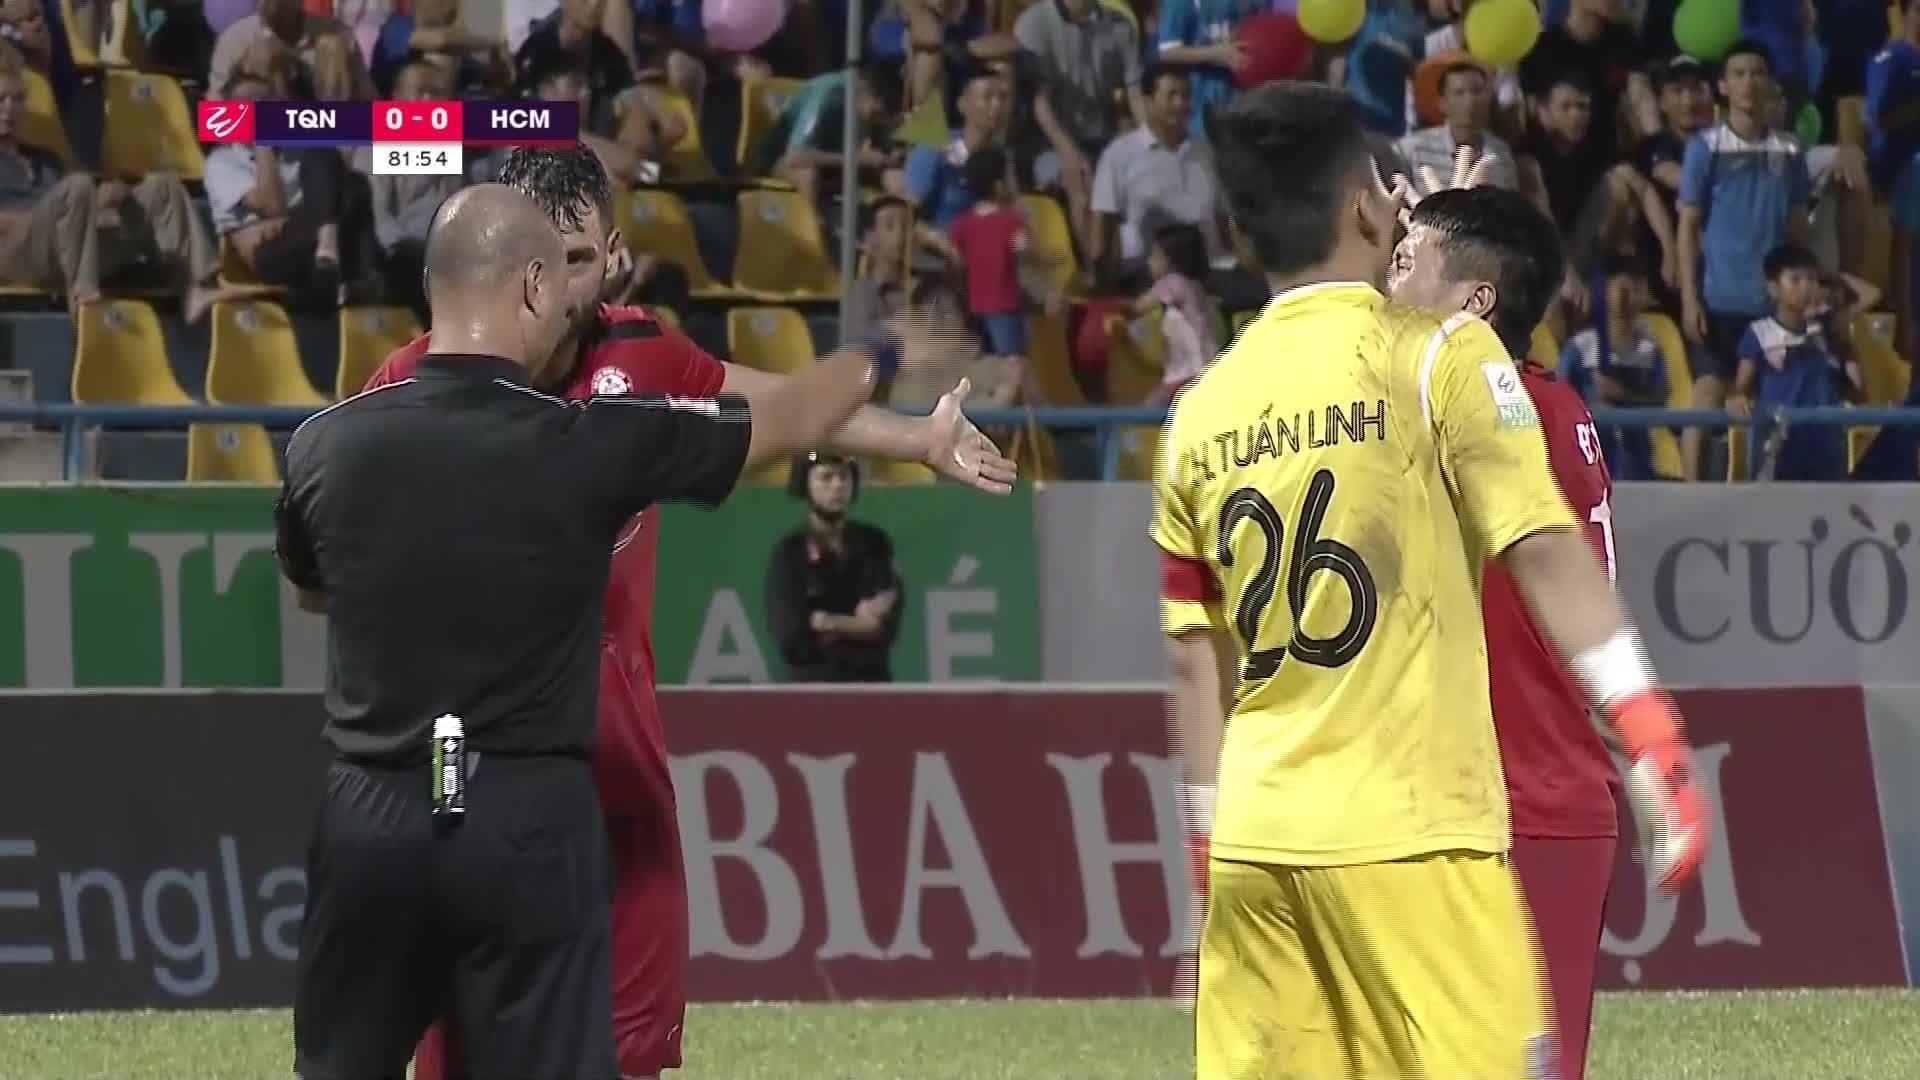 Quảng Ninh 1-0 TP HCM